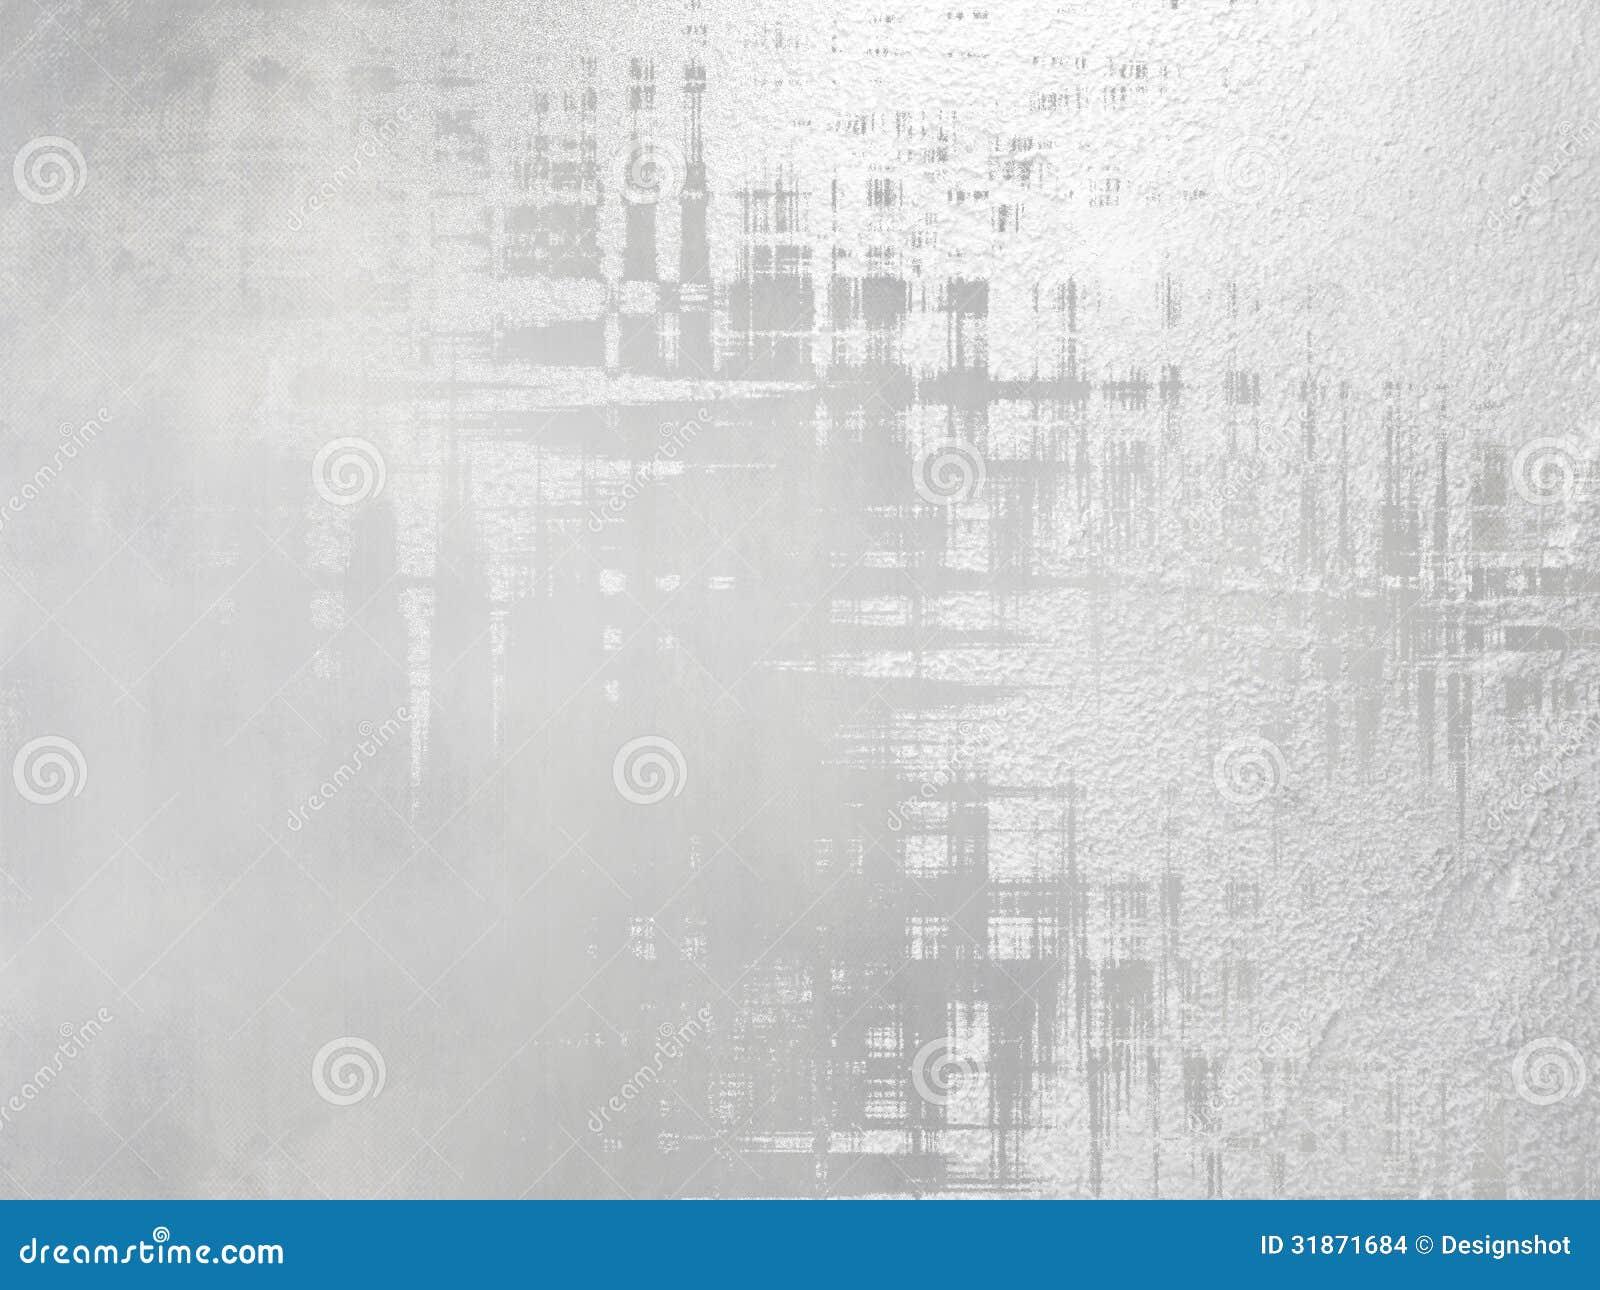 light gray background design - photo #27